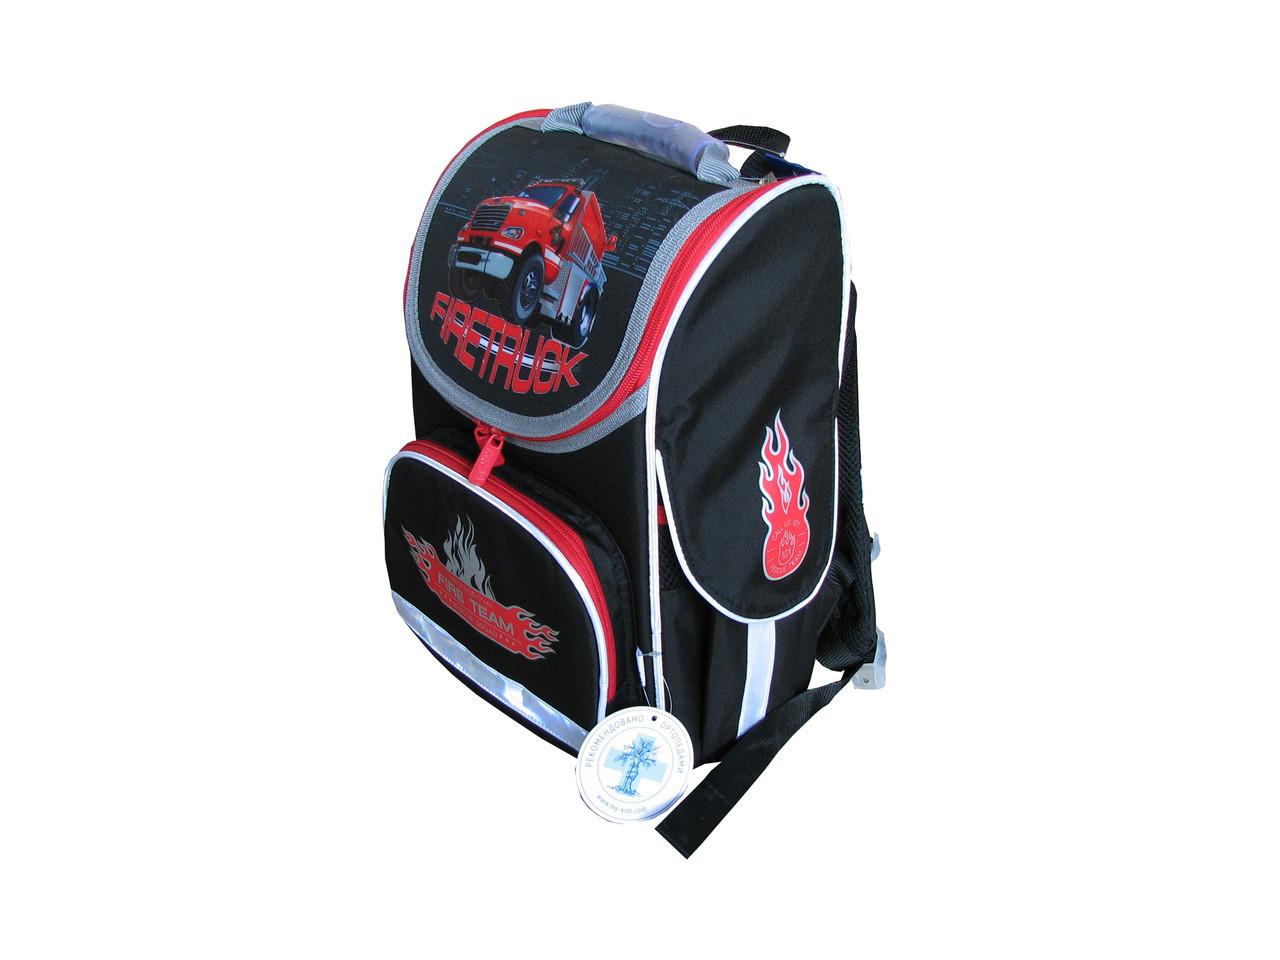 366e2ad8a0f2 Рюкзак школьный каркасный Kite Firetruck K18-501S-1: продажа, цена в ...